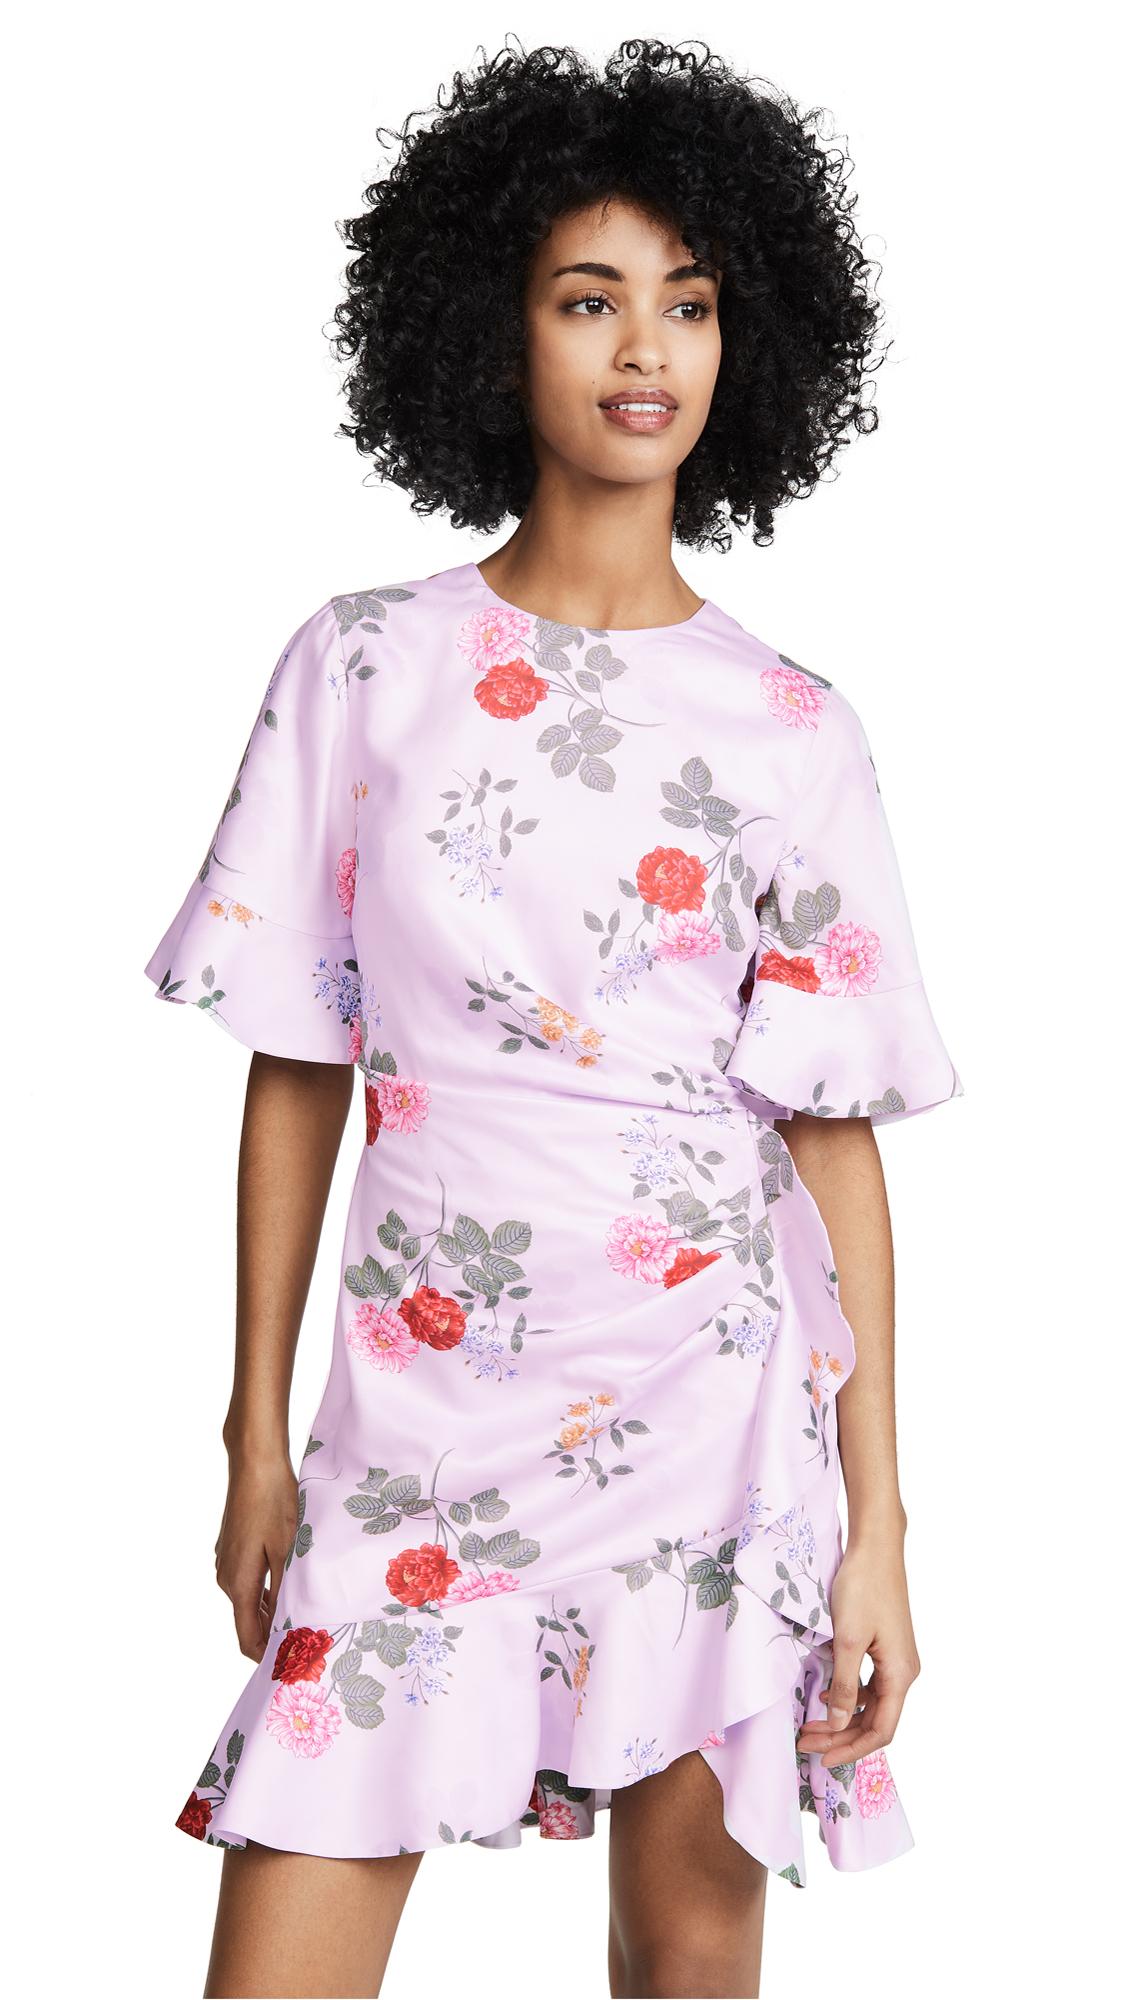 Keepsake Pretty One Mini Dress - Lilac Floral